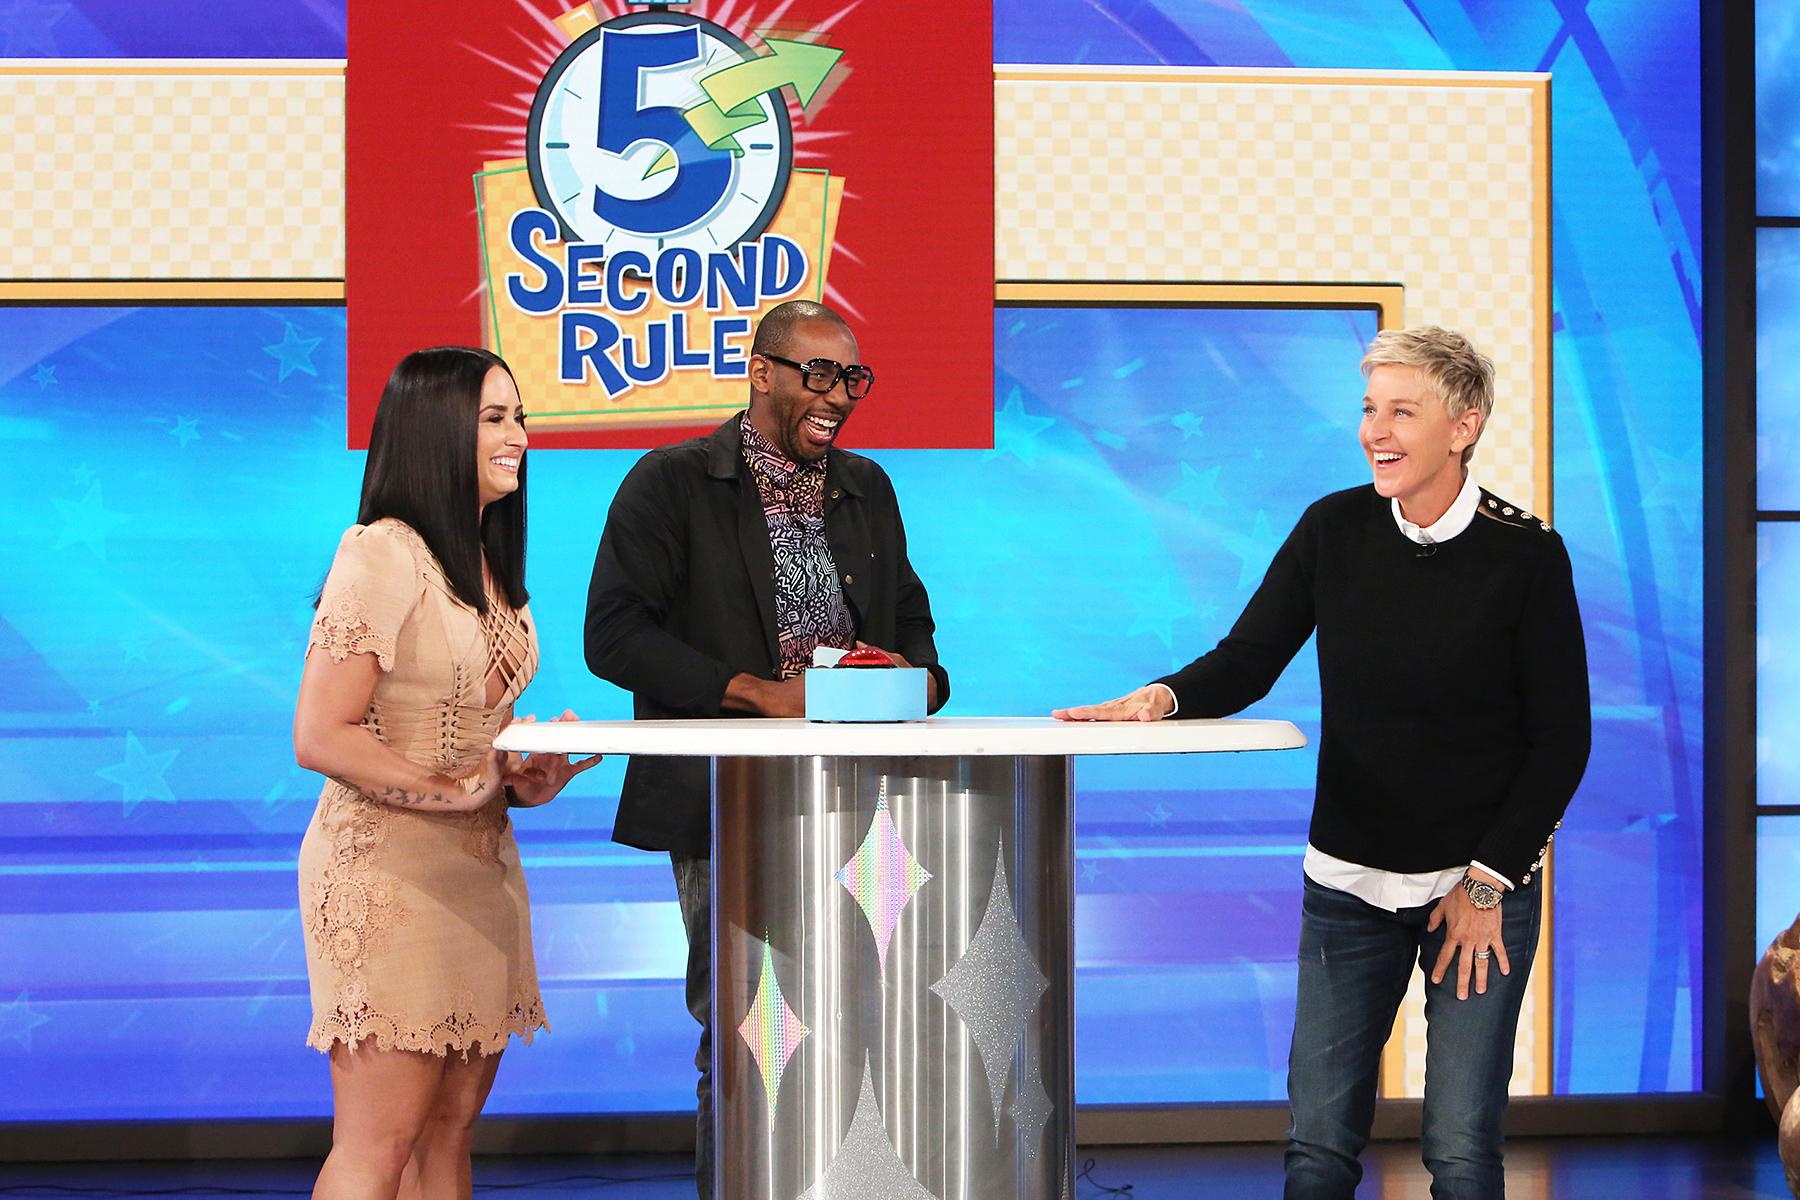 Demi Lovato Ellen DeGeneres 5-Second Rule Game